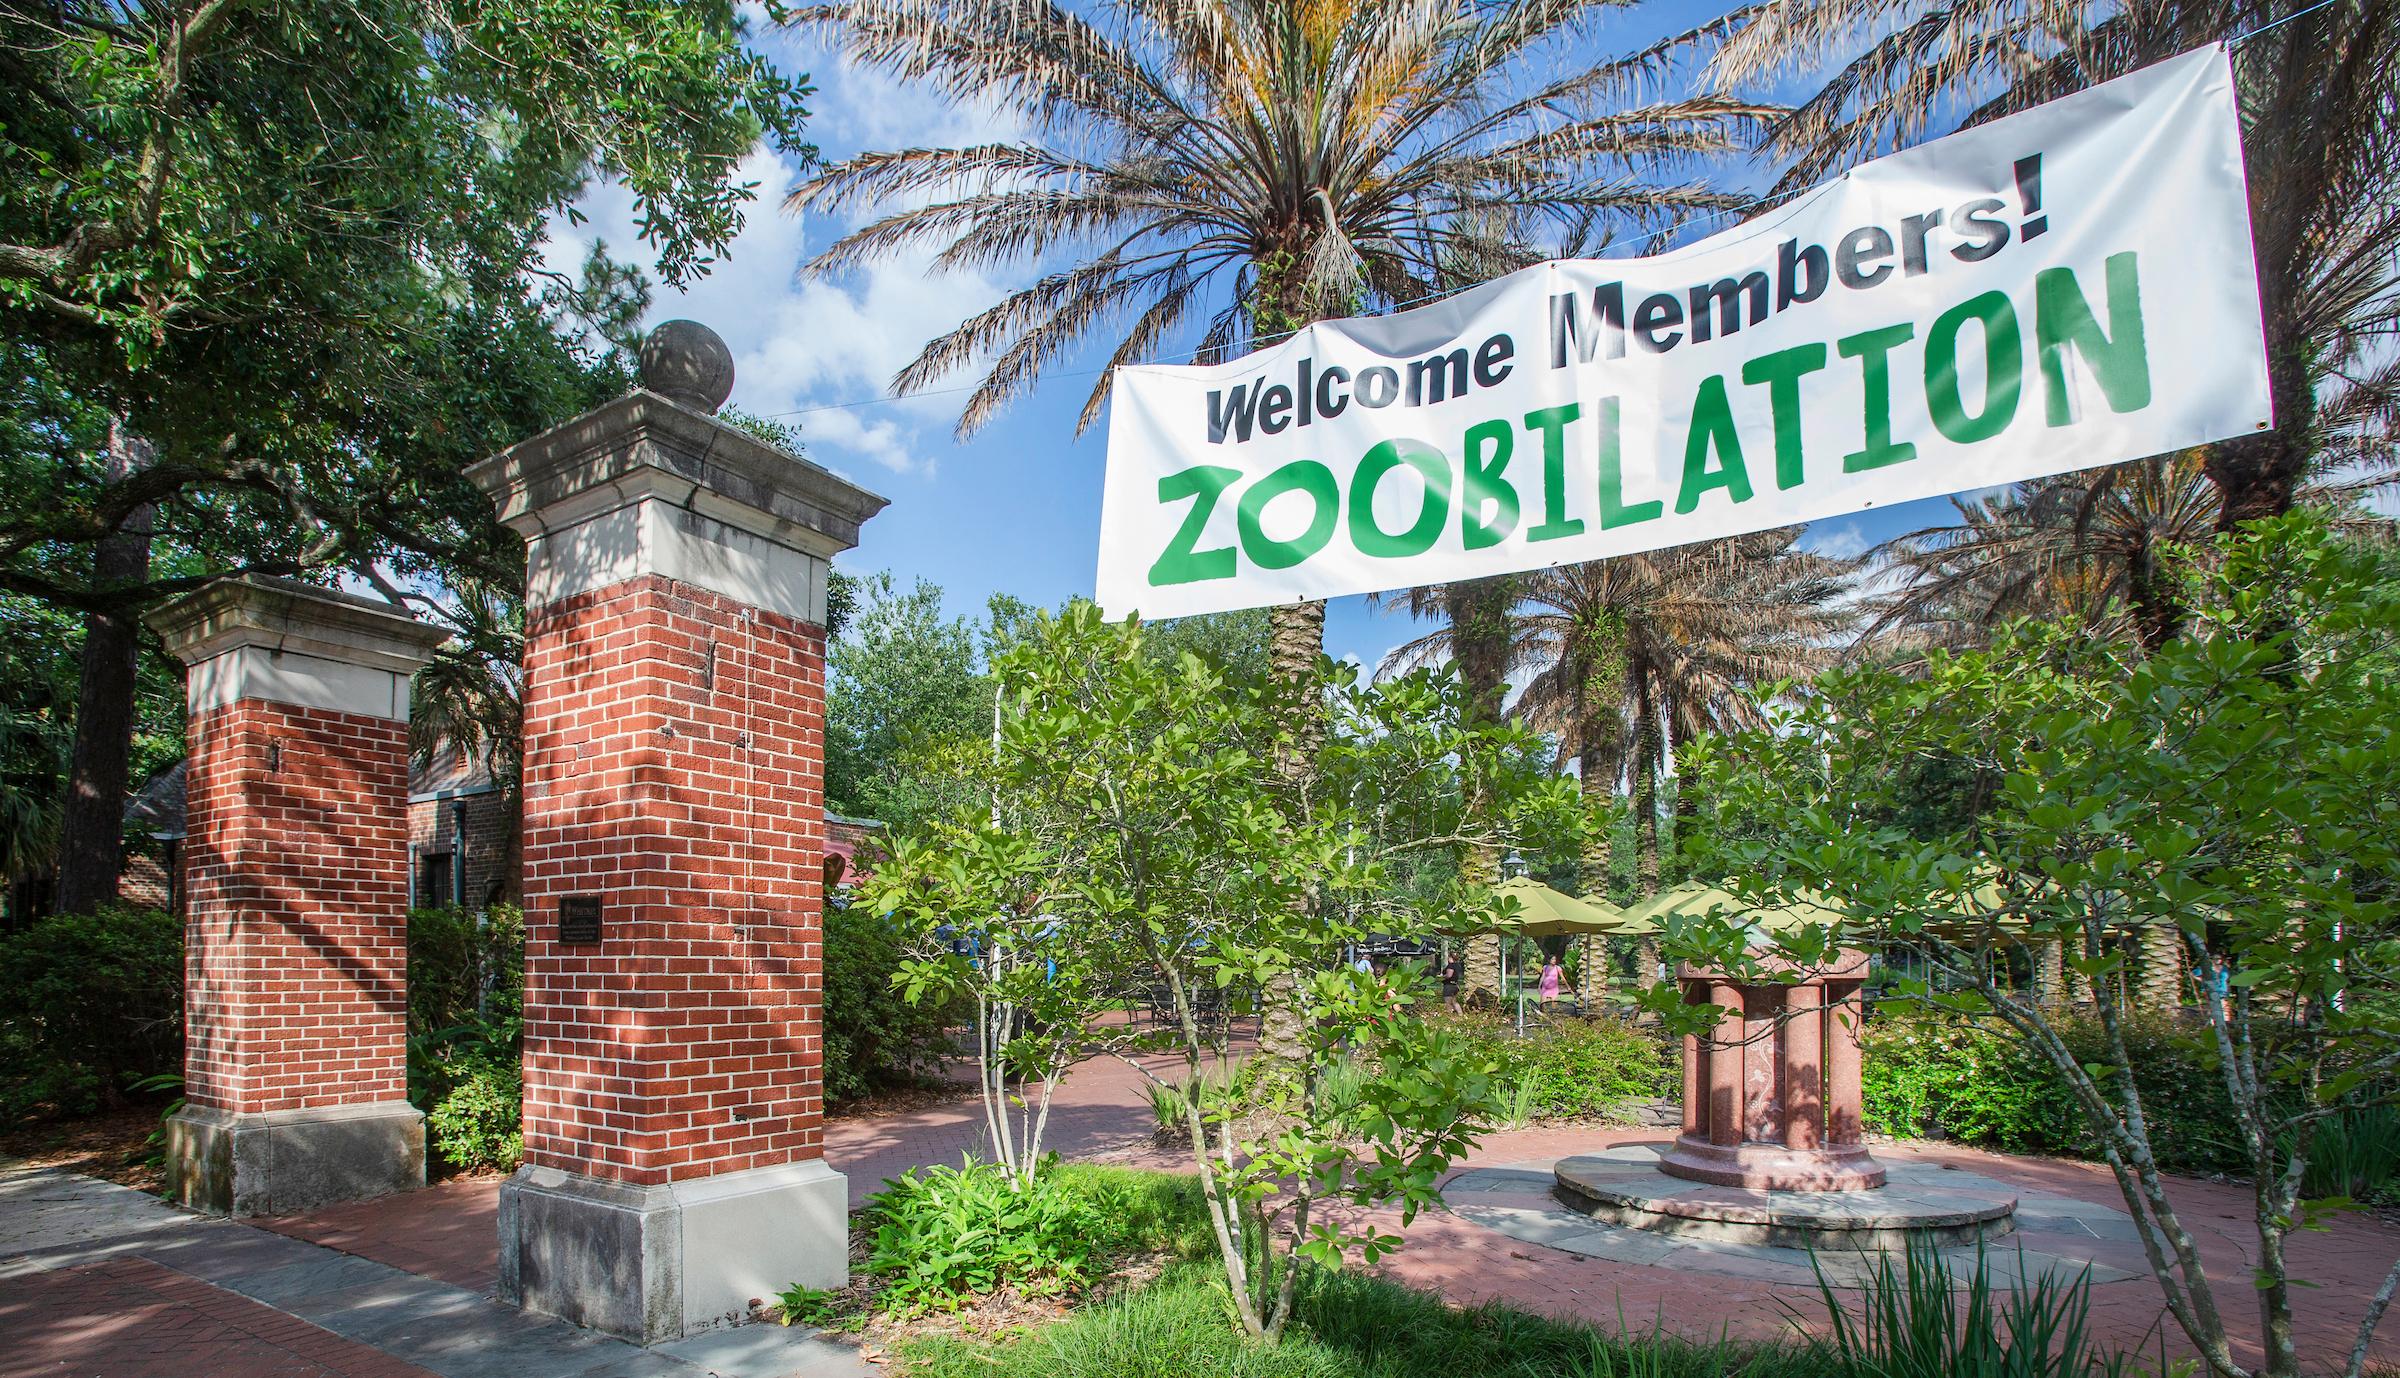 ZOObilation Member-Only Event Returns to Audubon Zoo